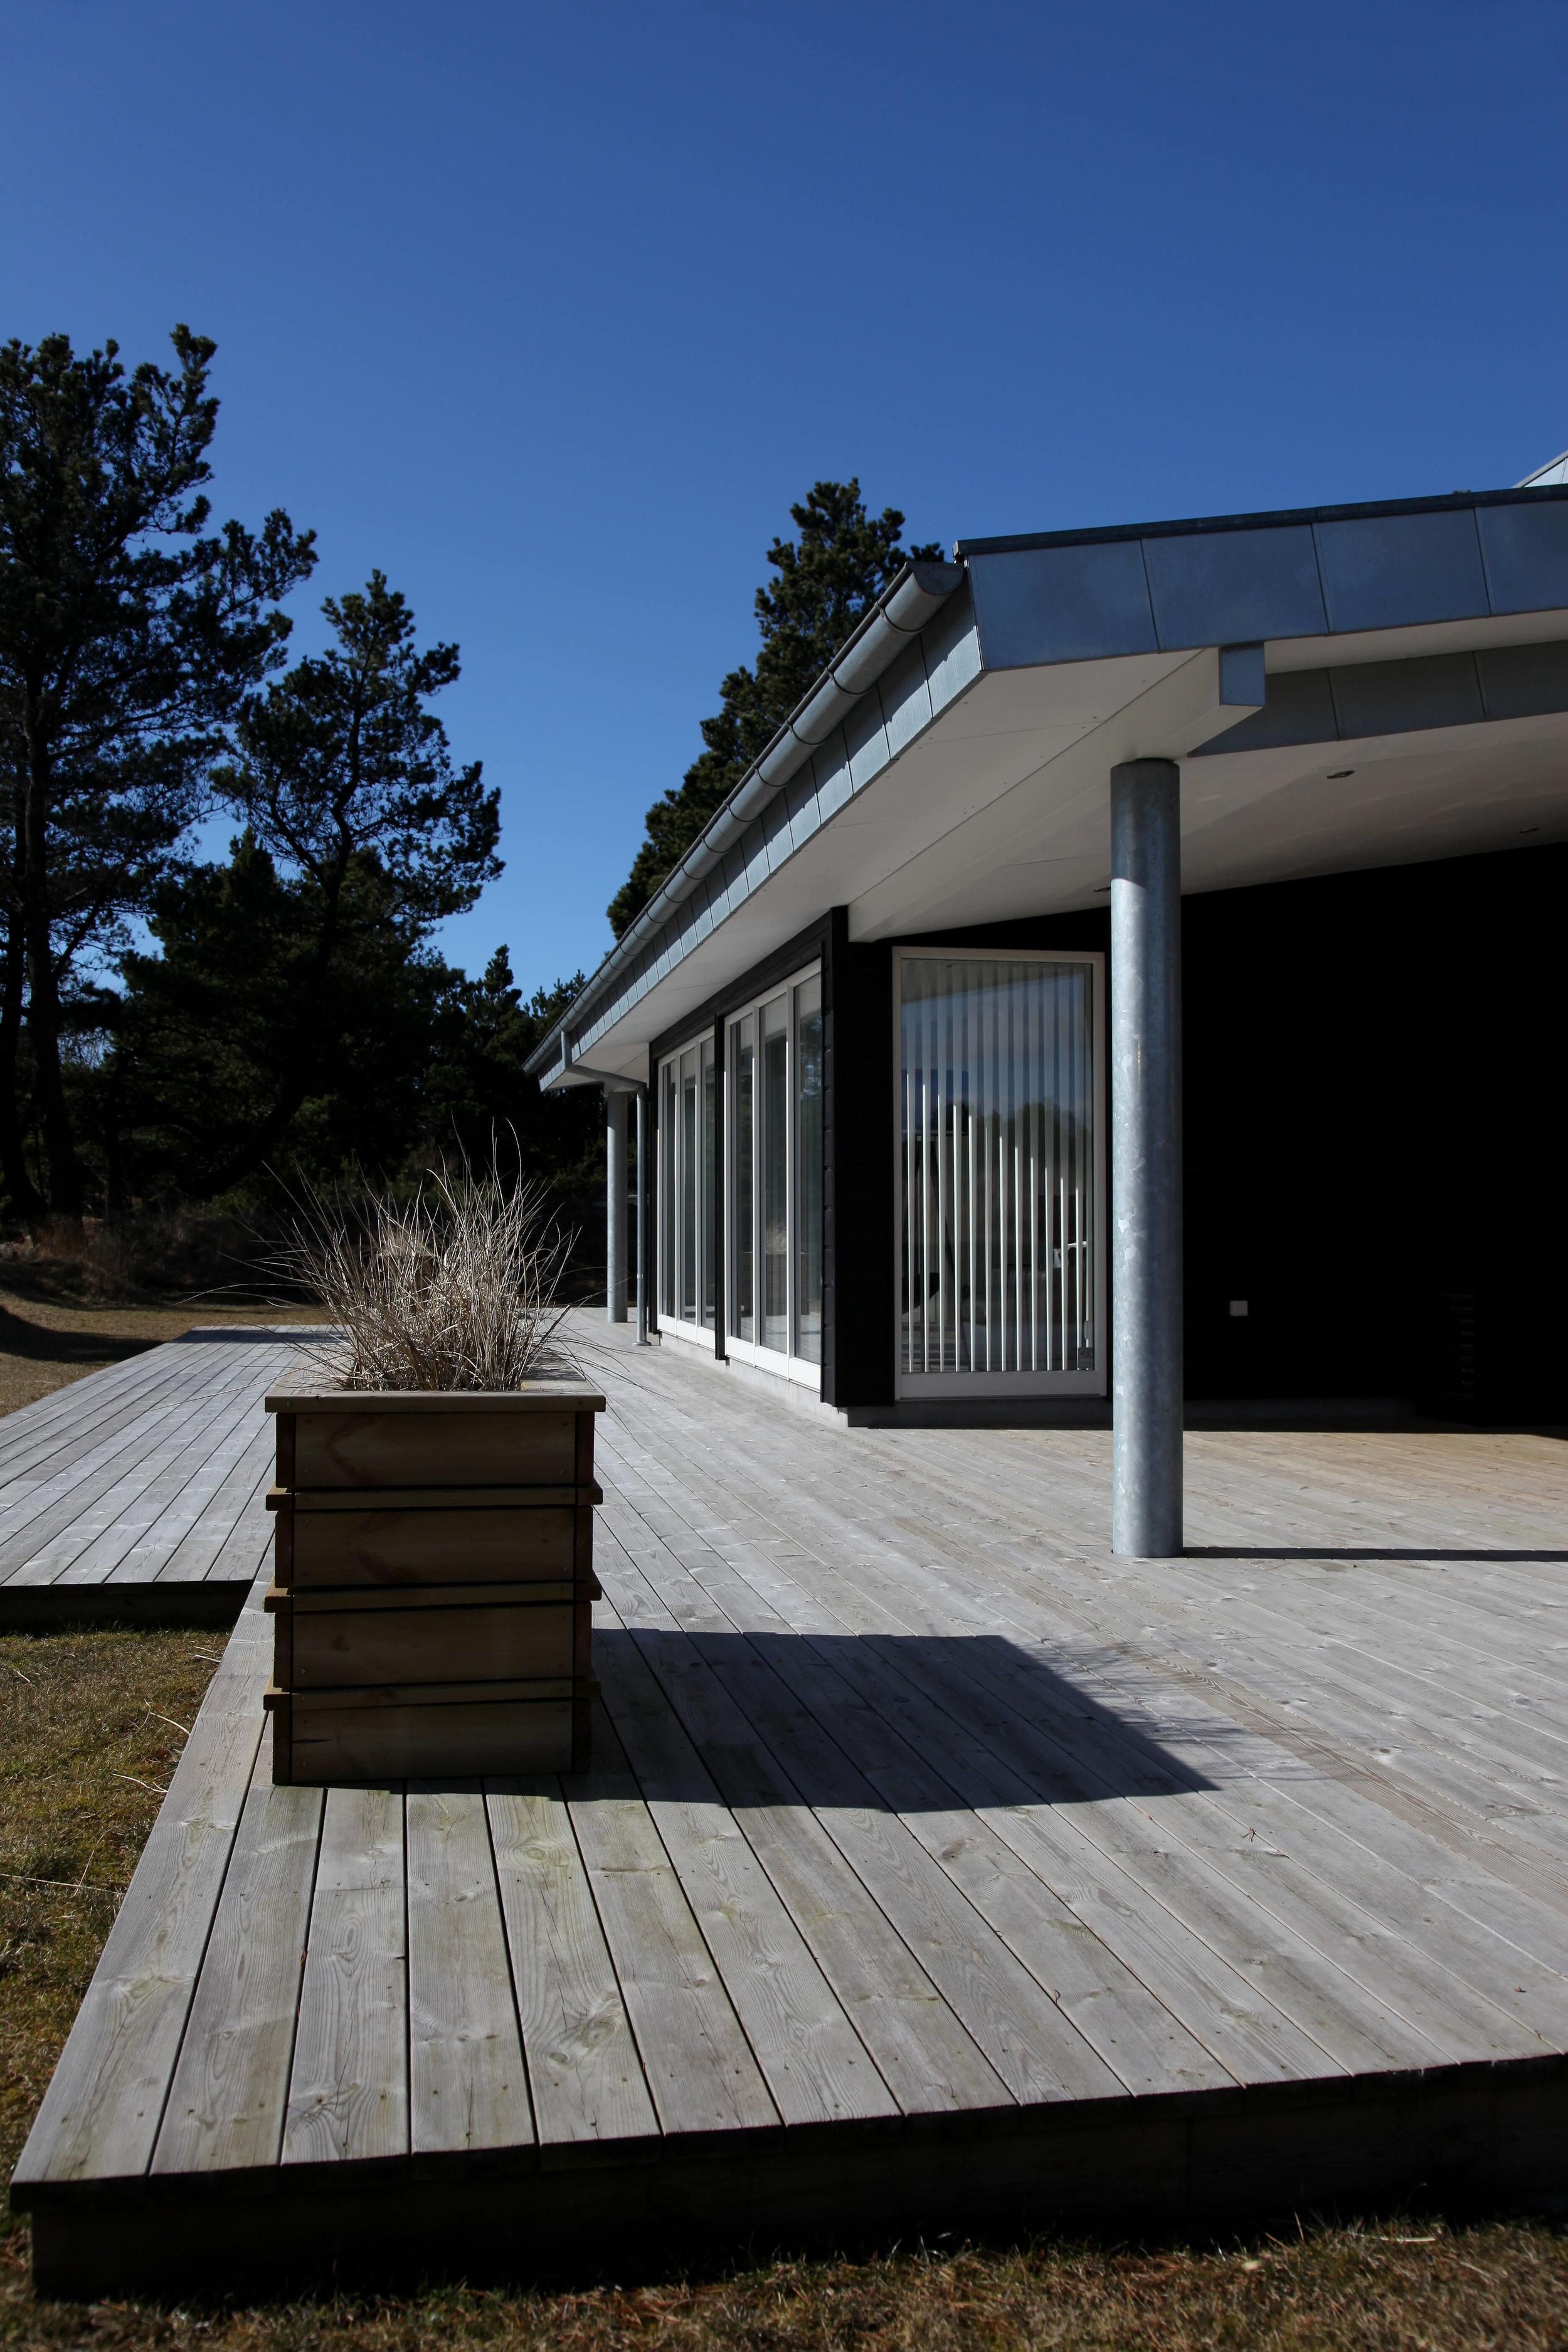 Arkitektfirmaet Vest Referencer sommerhuse4.jpg